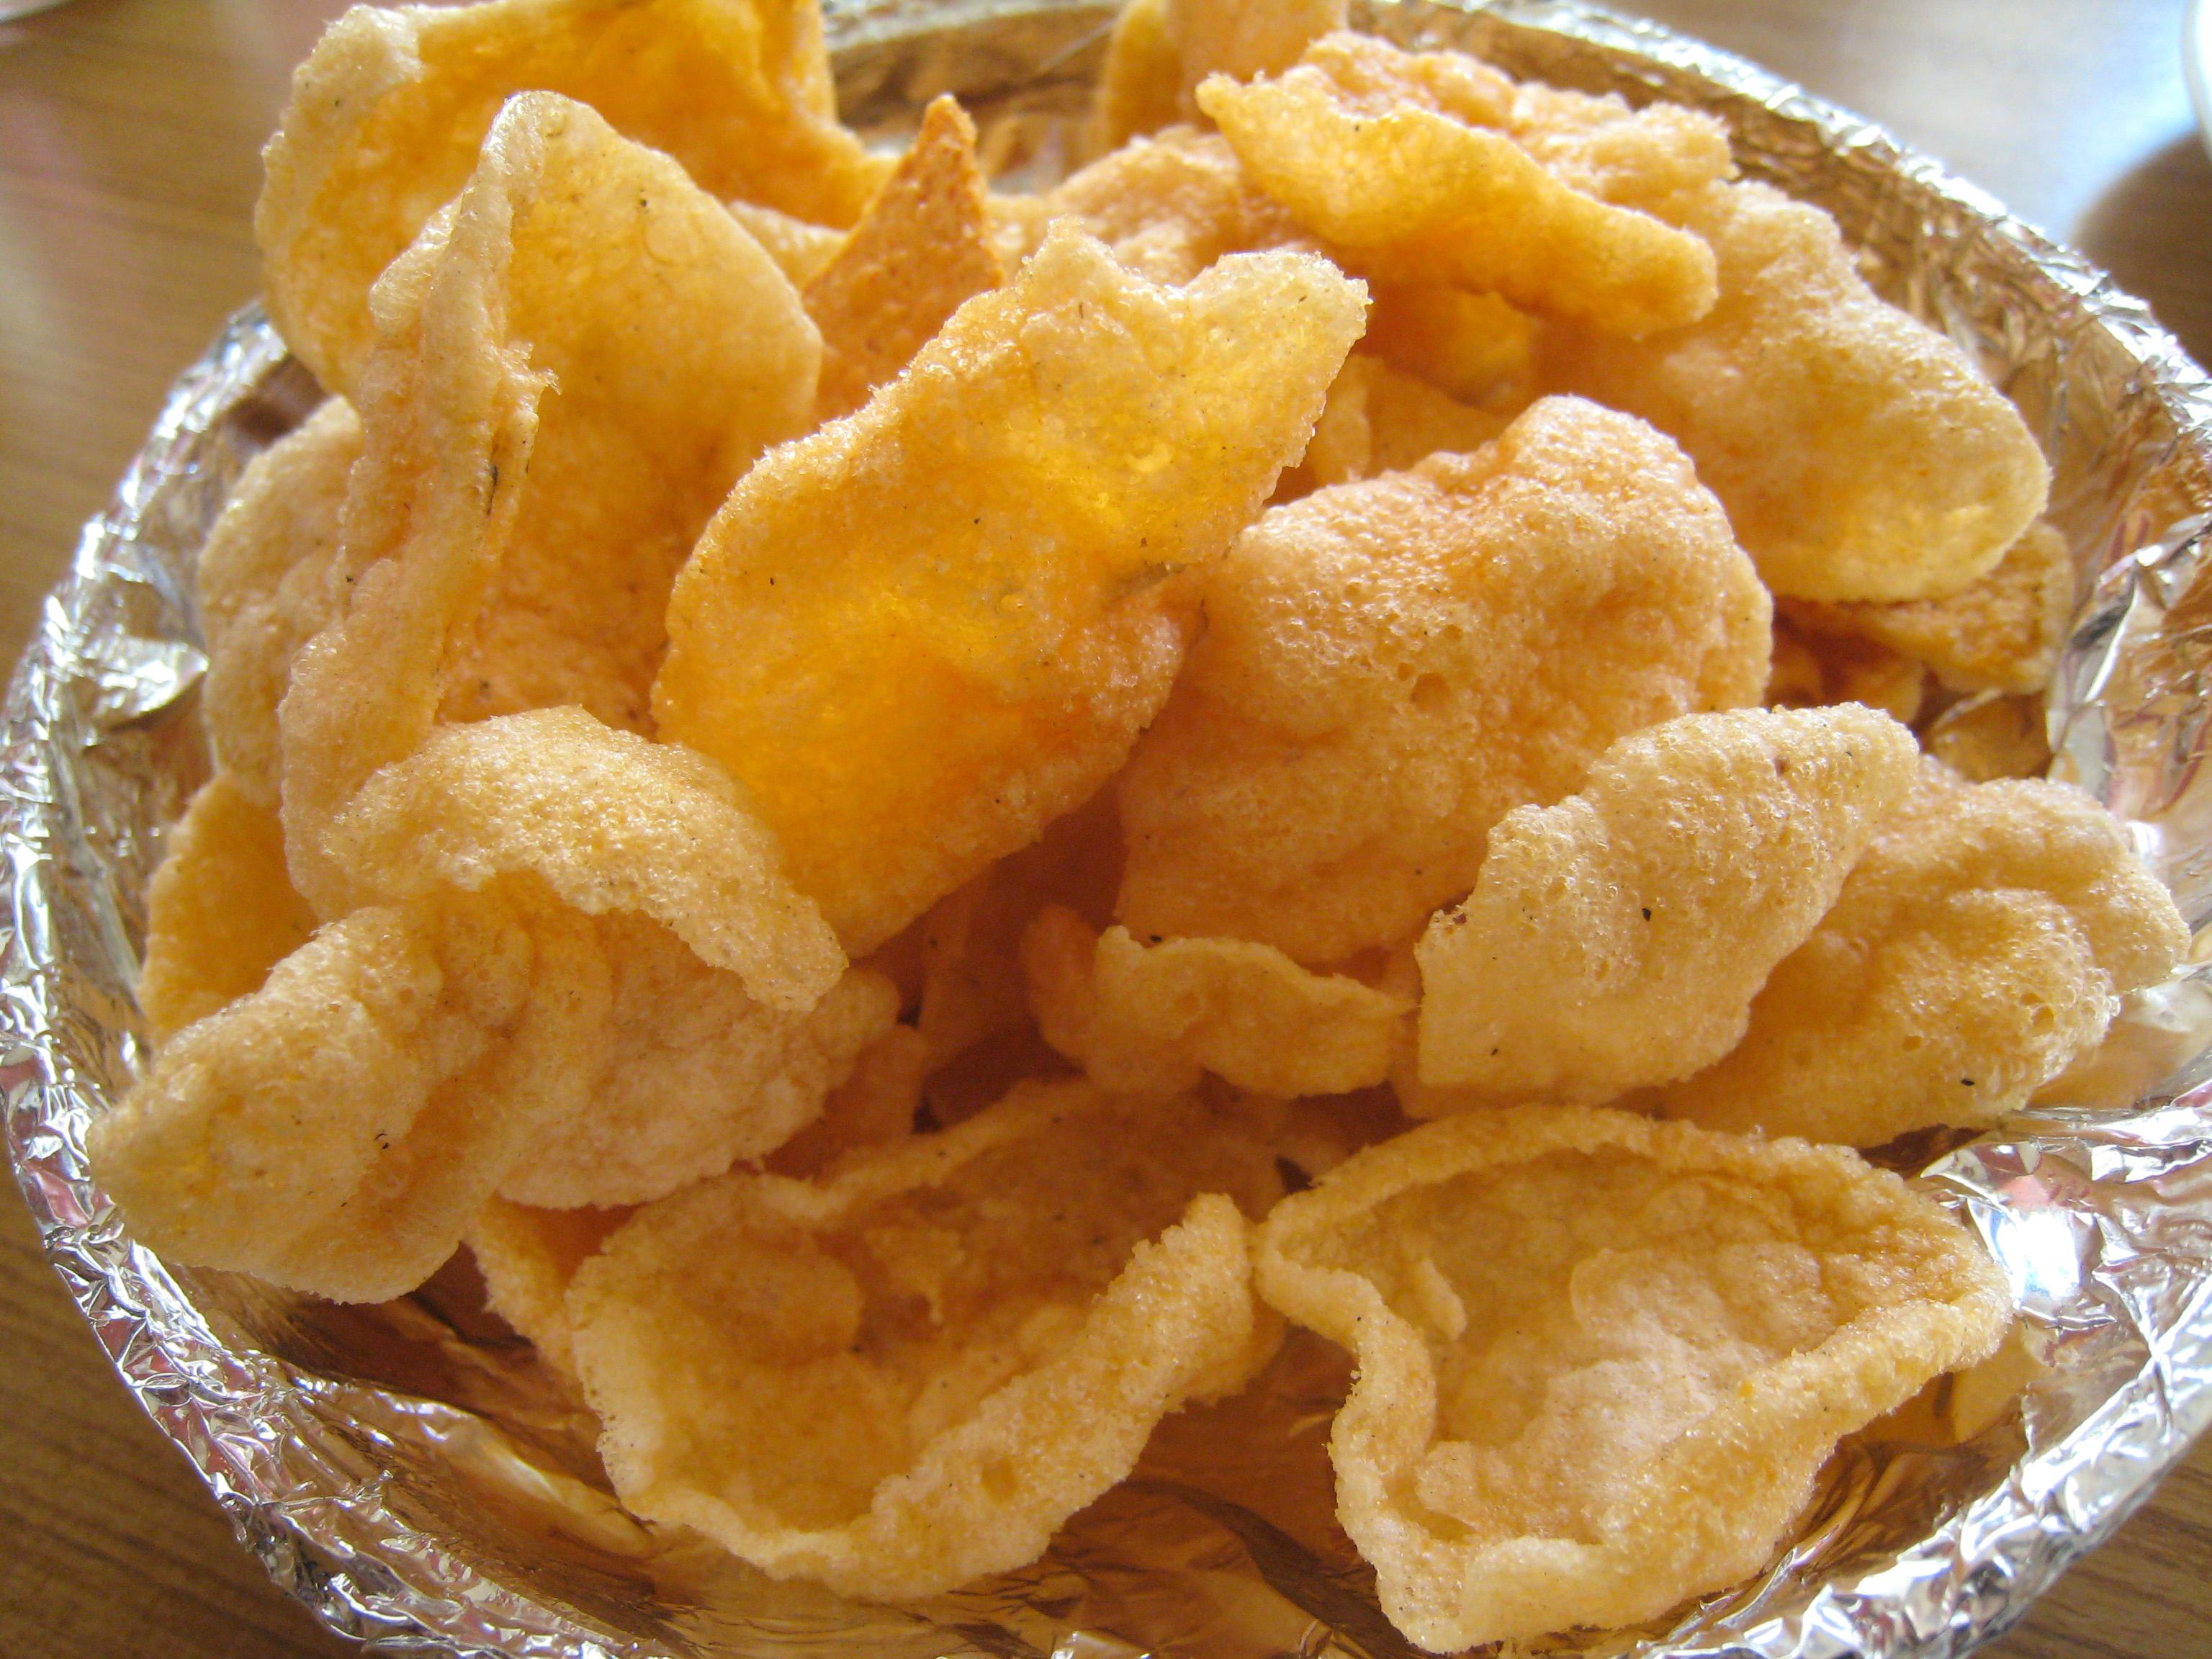 File:Deep fried rice Papad jpg - Wikimedia Commons